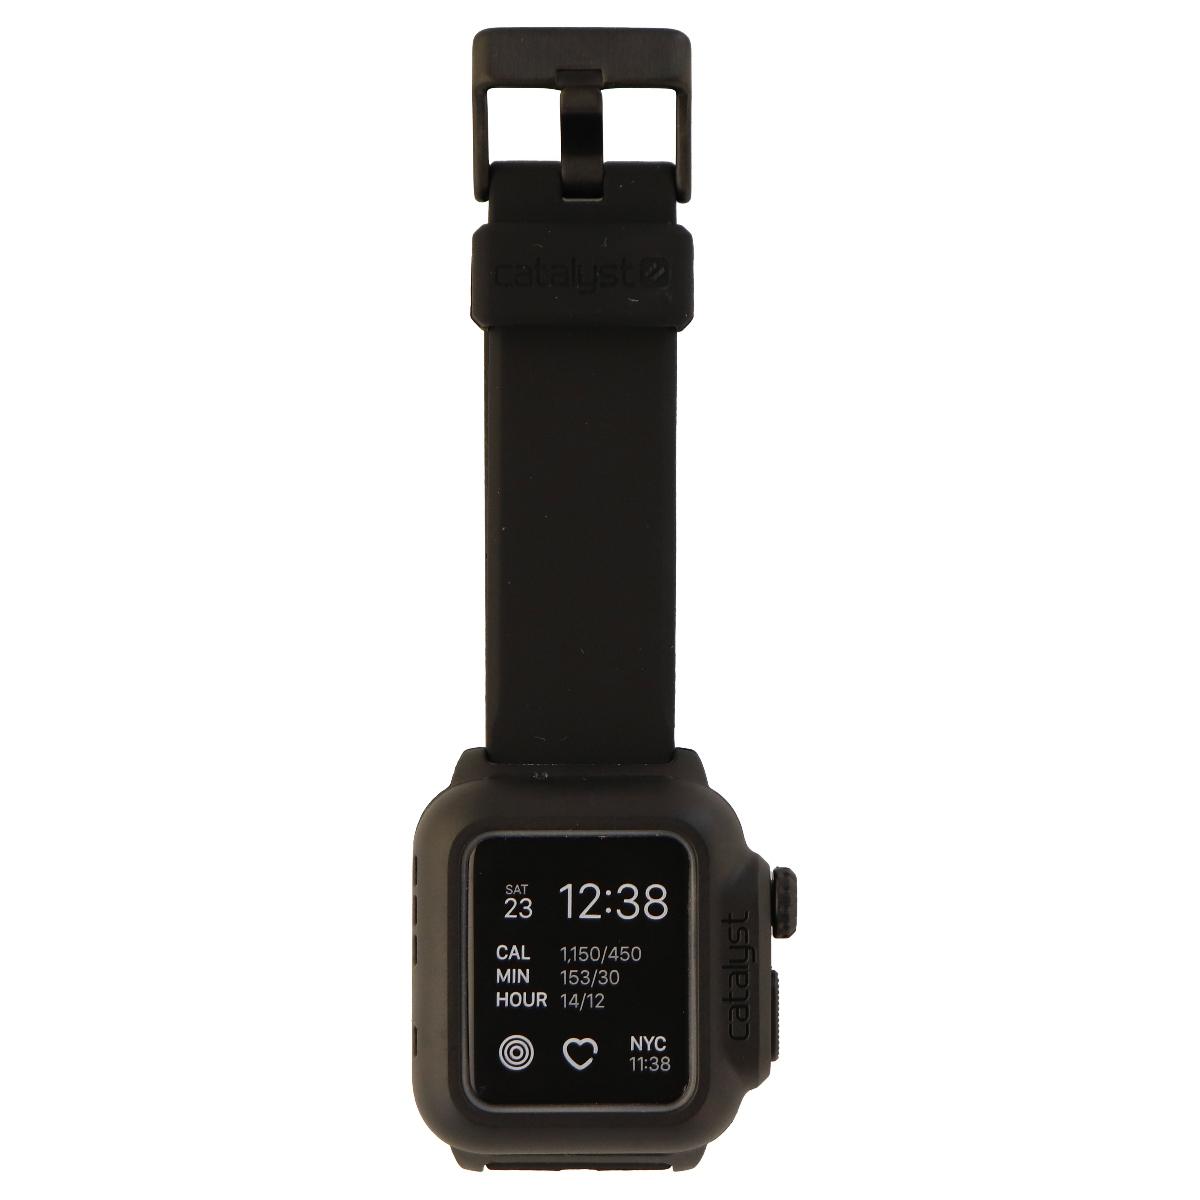 Catalyst Case for Apple Watch 38mm Series 2 - WaterProof - Stealth Black